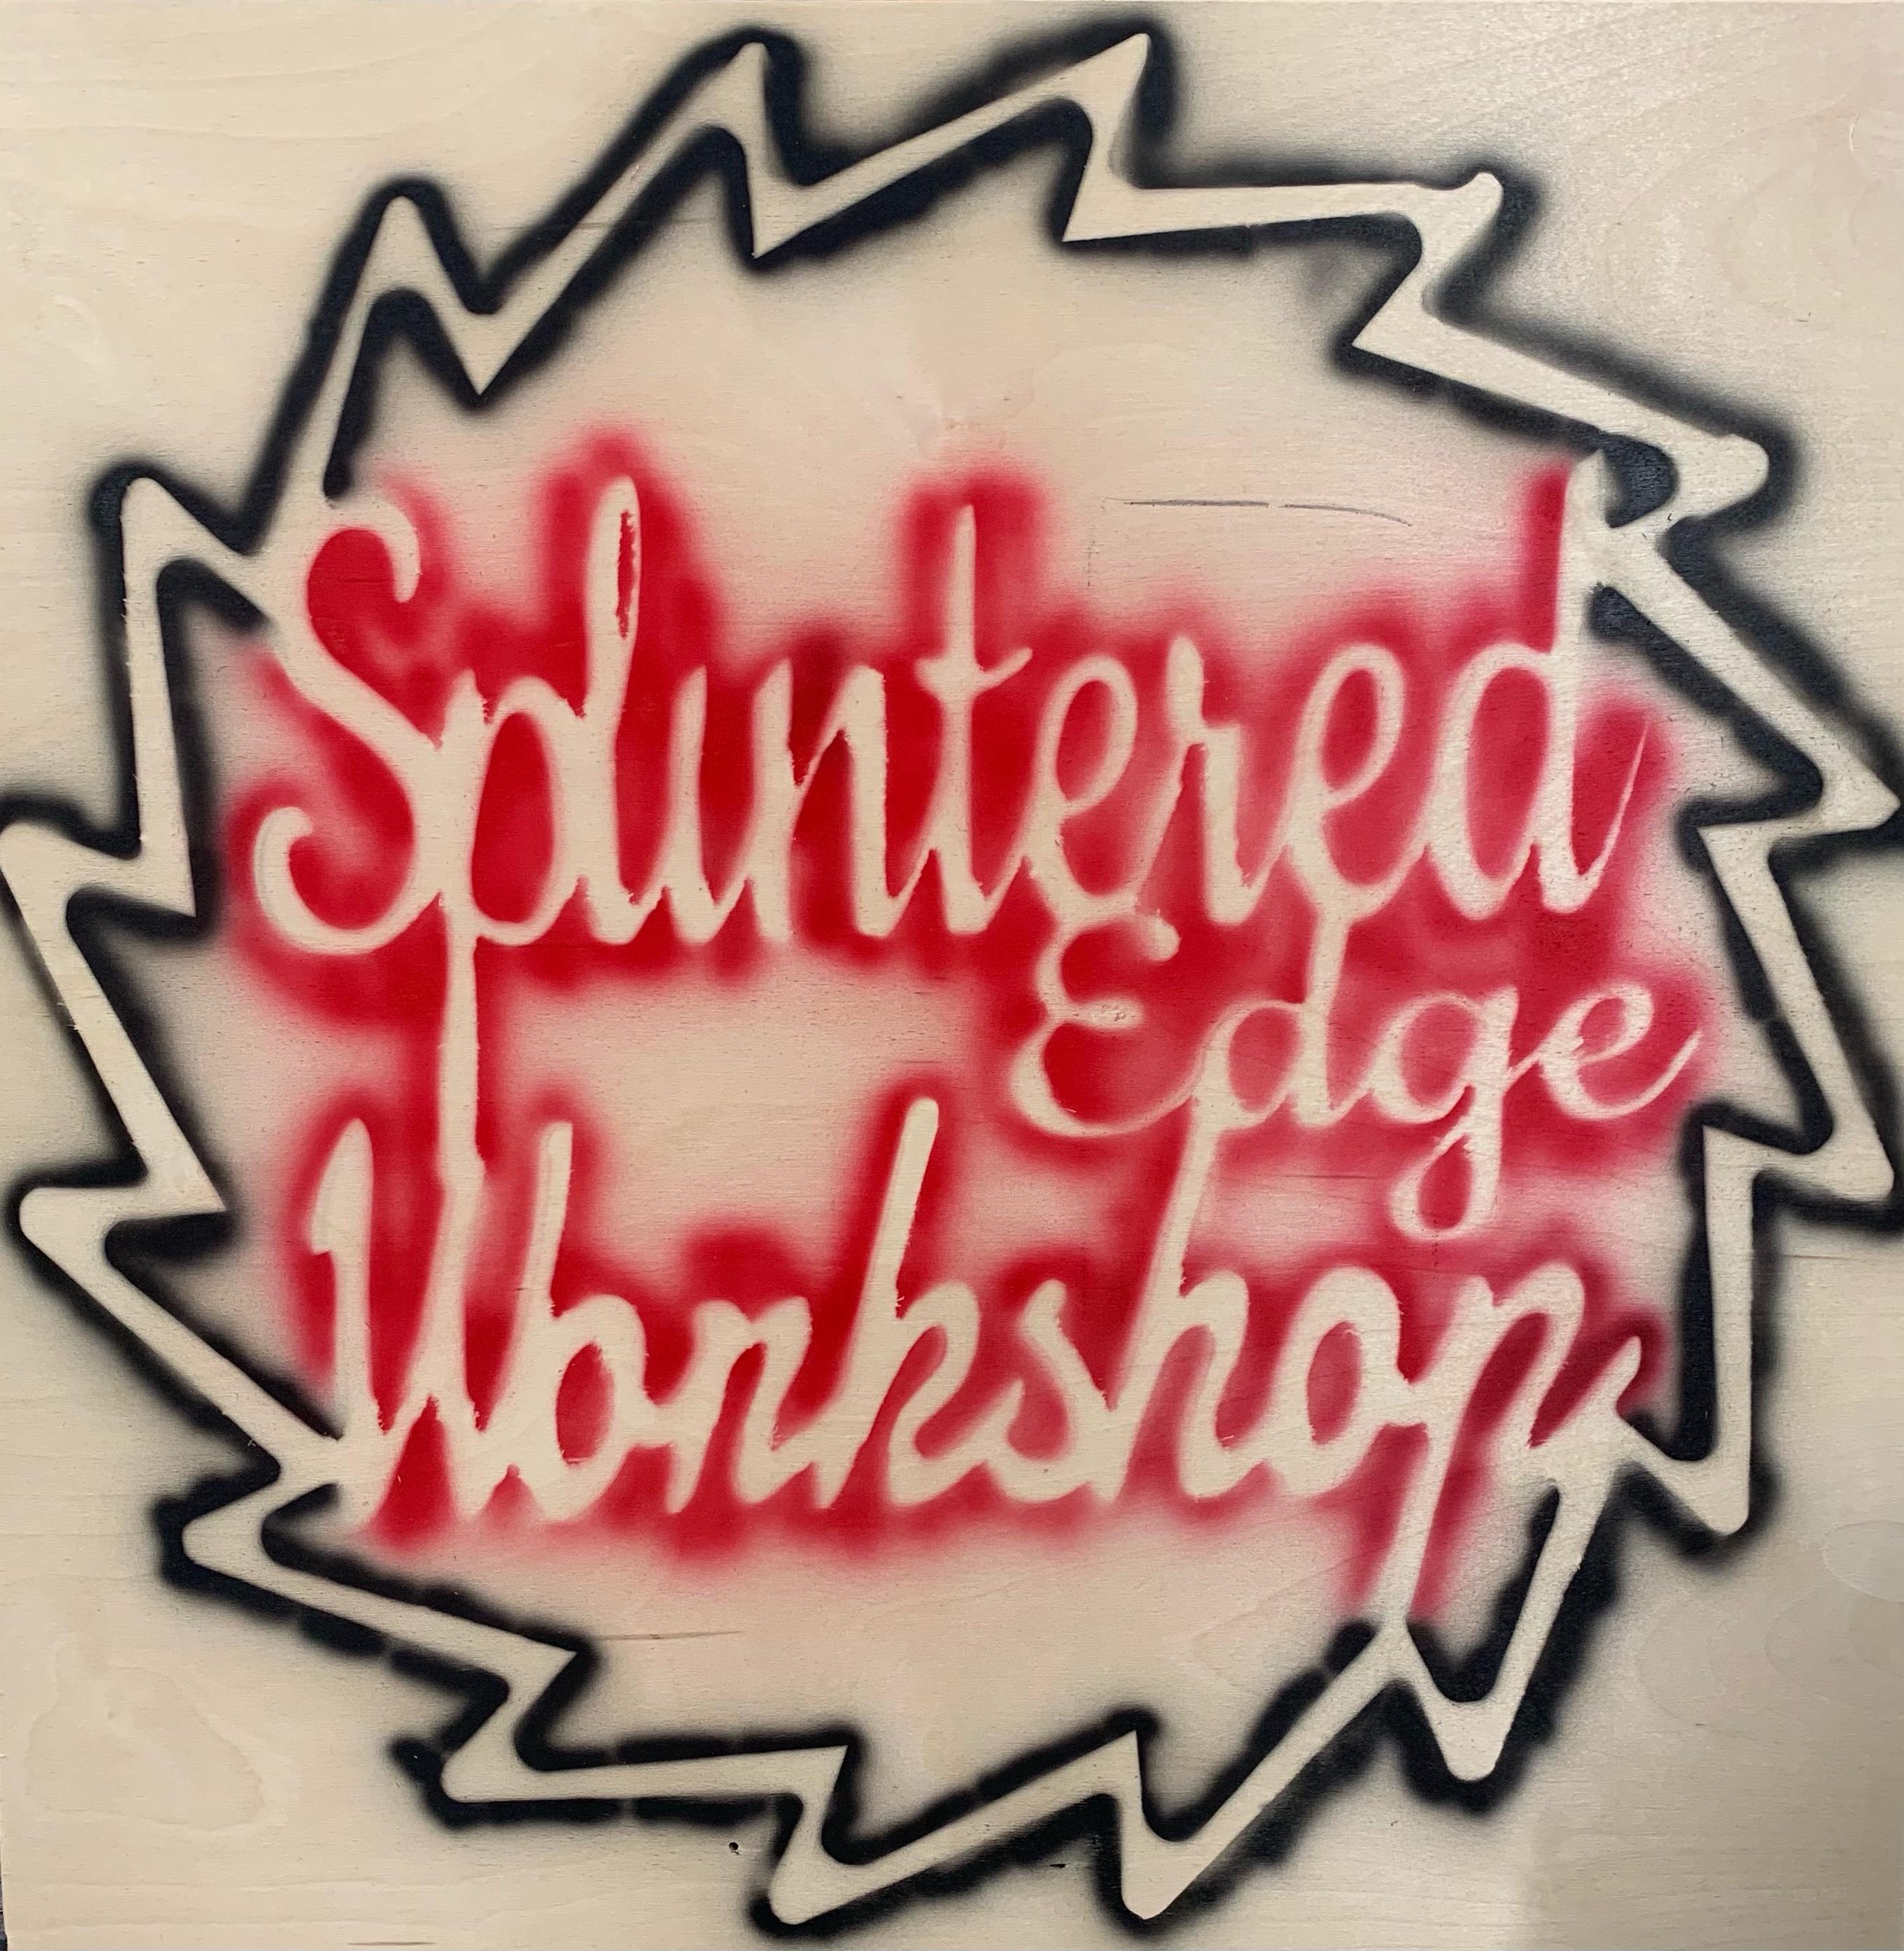 Splintered Edge Workshop